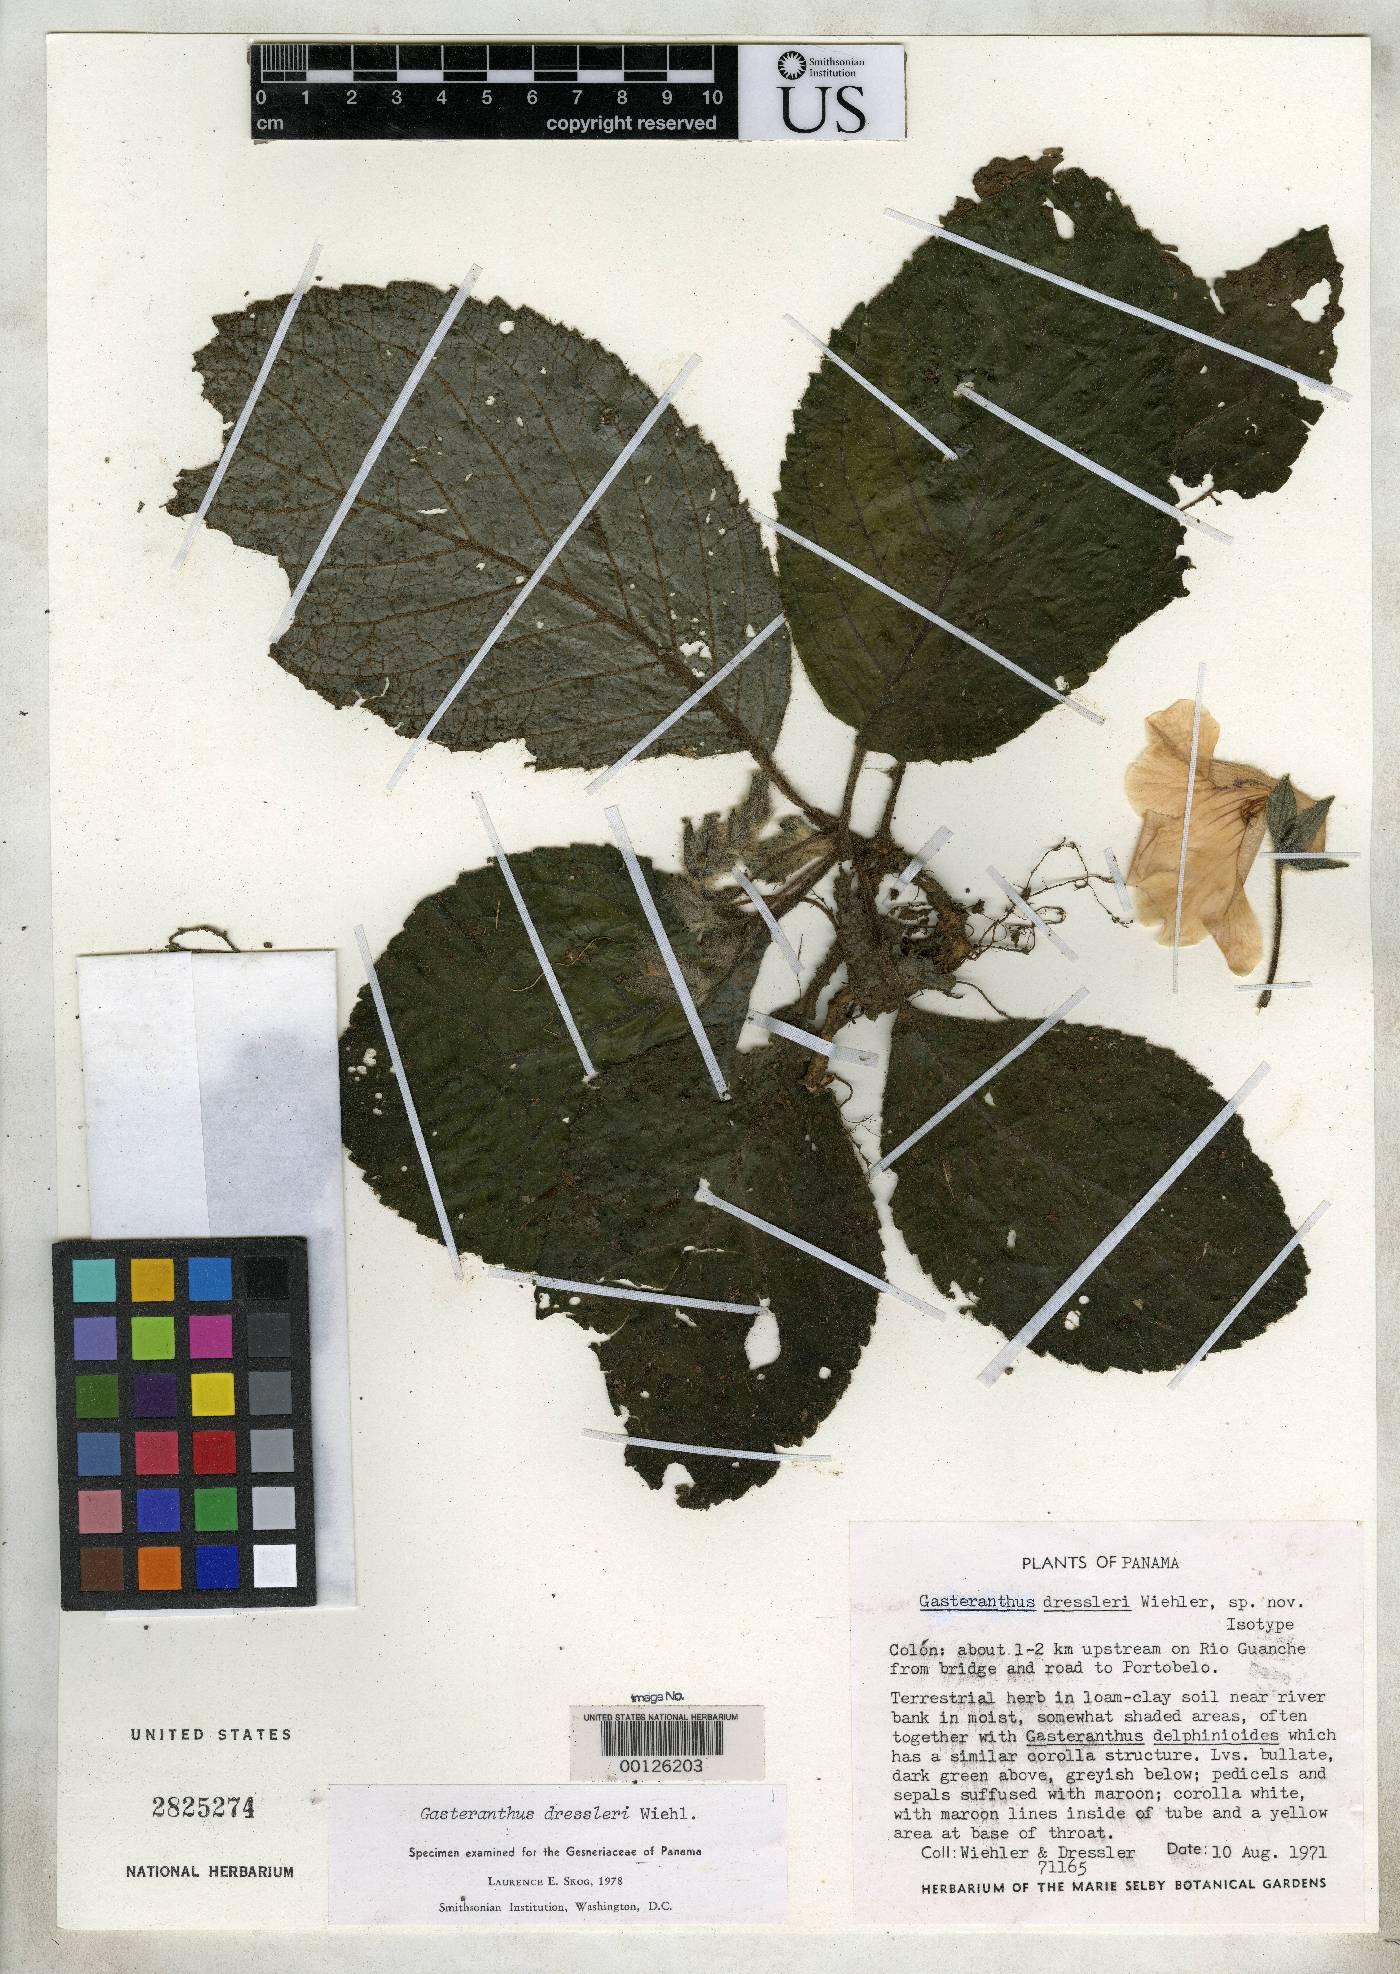 Gasteranthus dressleri image